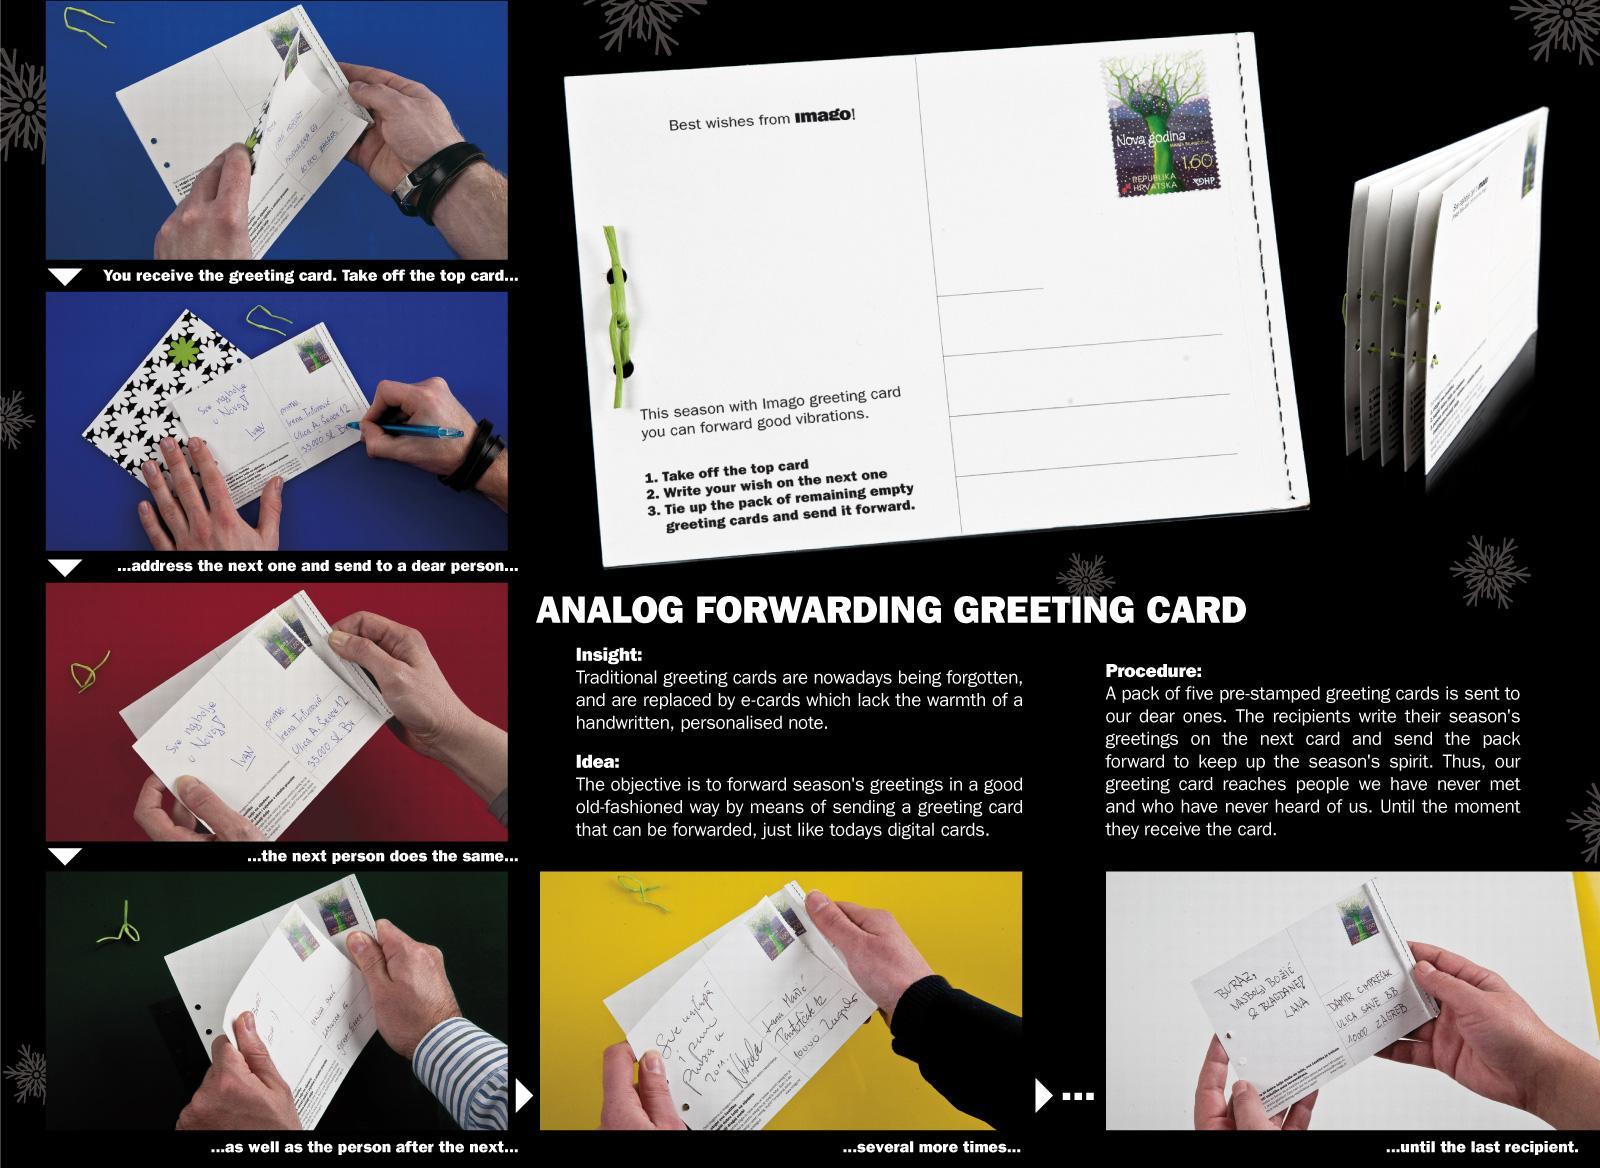 Imago Digital Ad -  Analog forwarding greeting card